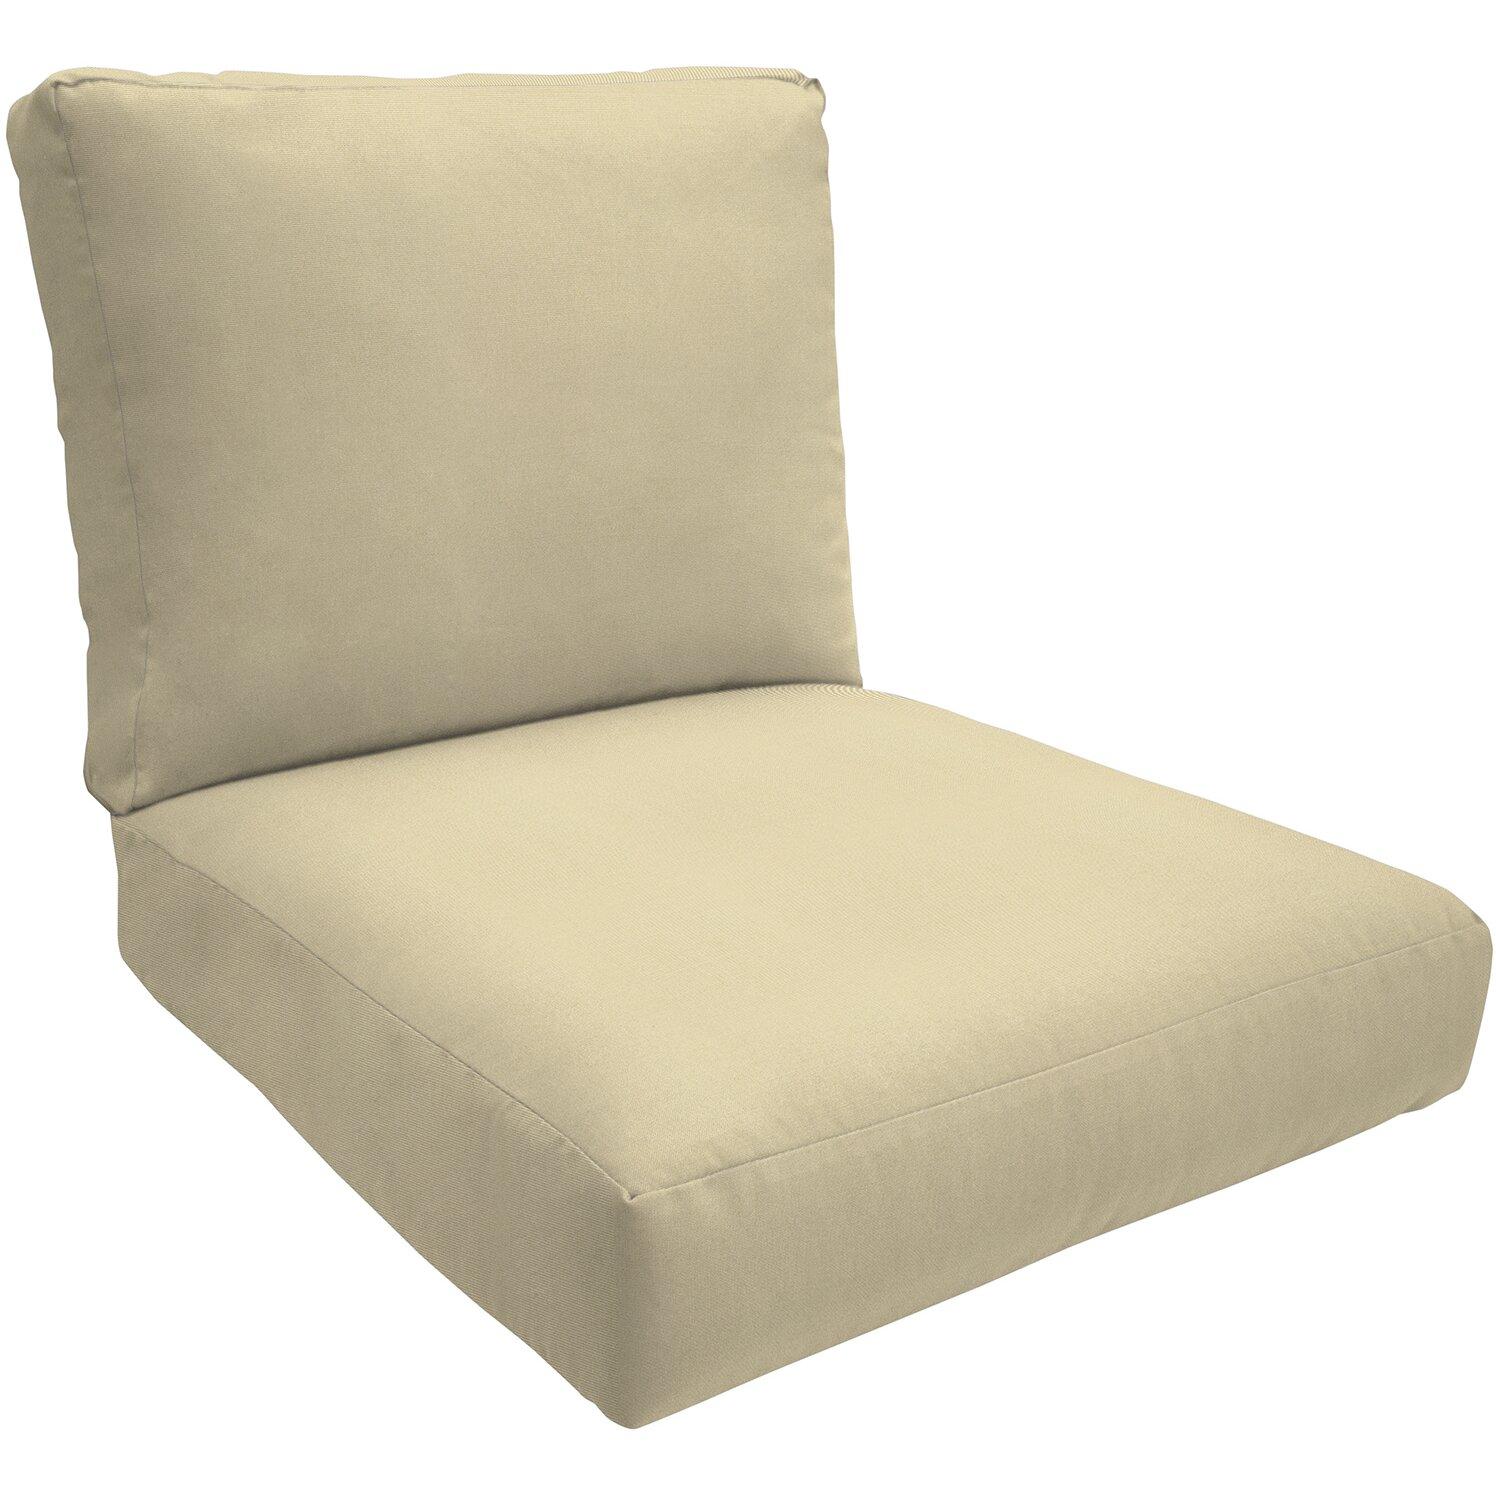 Knife Edge Outdoor Sunbrella Lounge Chair Cushion. Wayfair Custom Outdoor Cushions   Wayfair